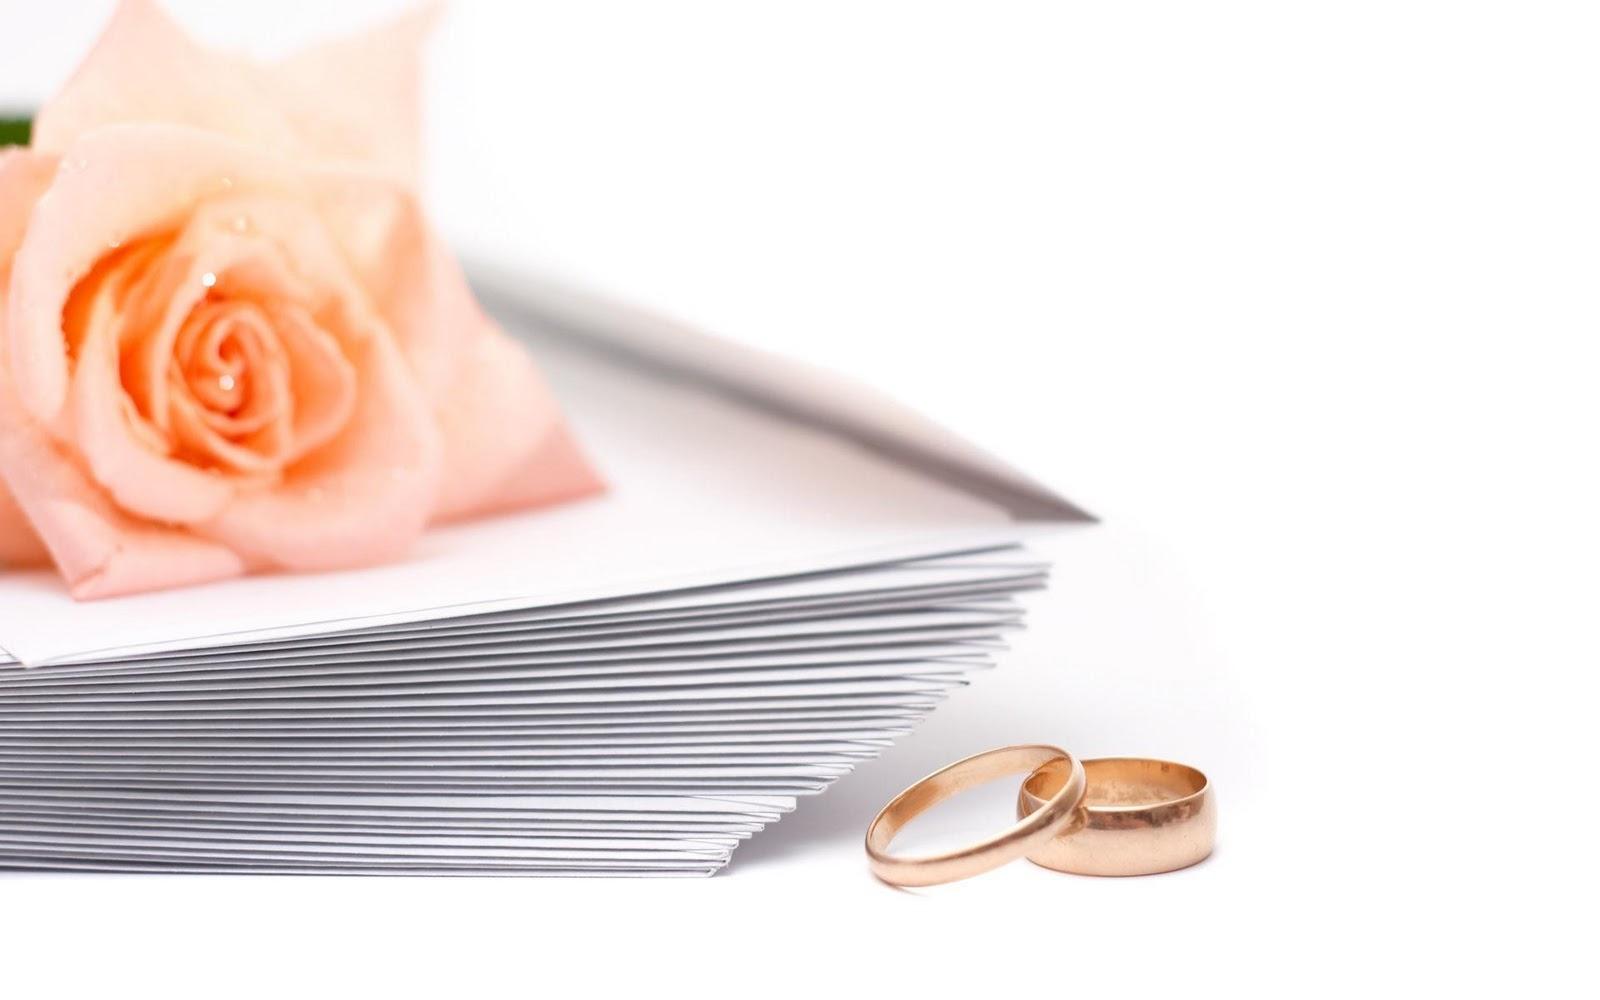 Weddings and wedding ring wallpaper  1   6 - 1920x1200.